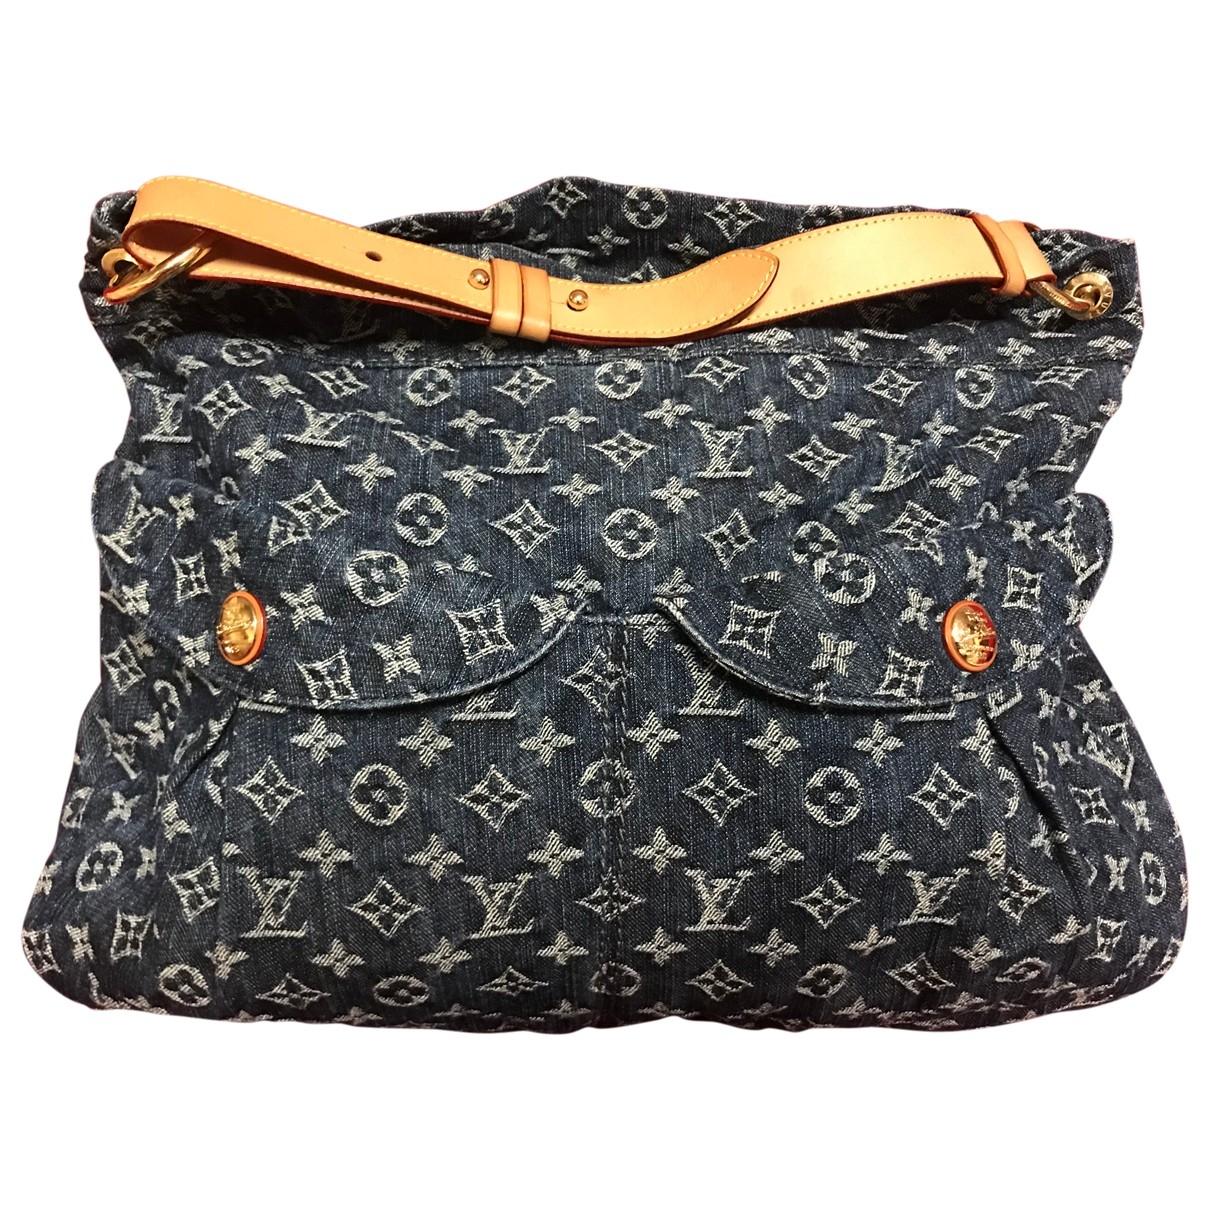 Louis Vuitton Daily Blue Denim - Jeans handbag for Women \N